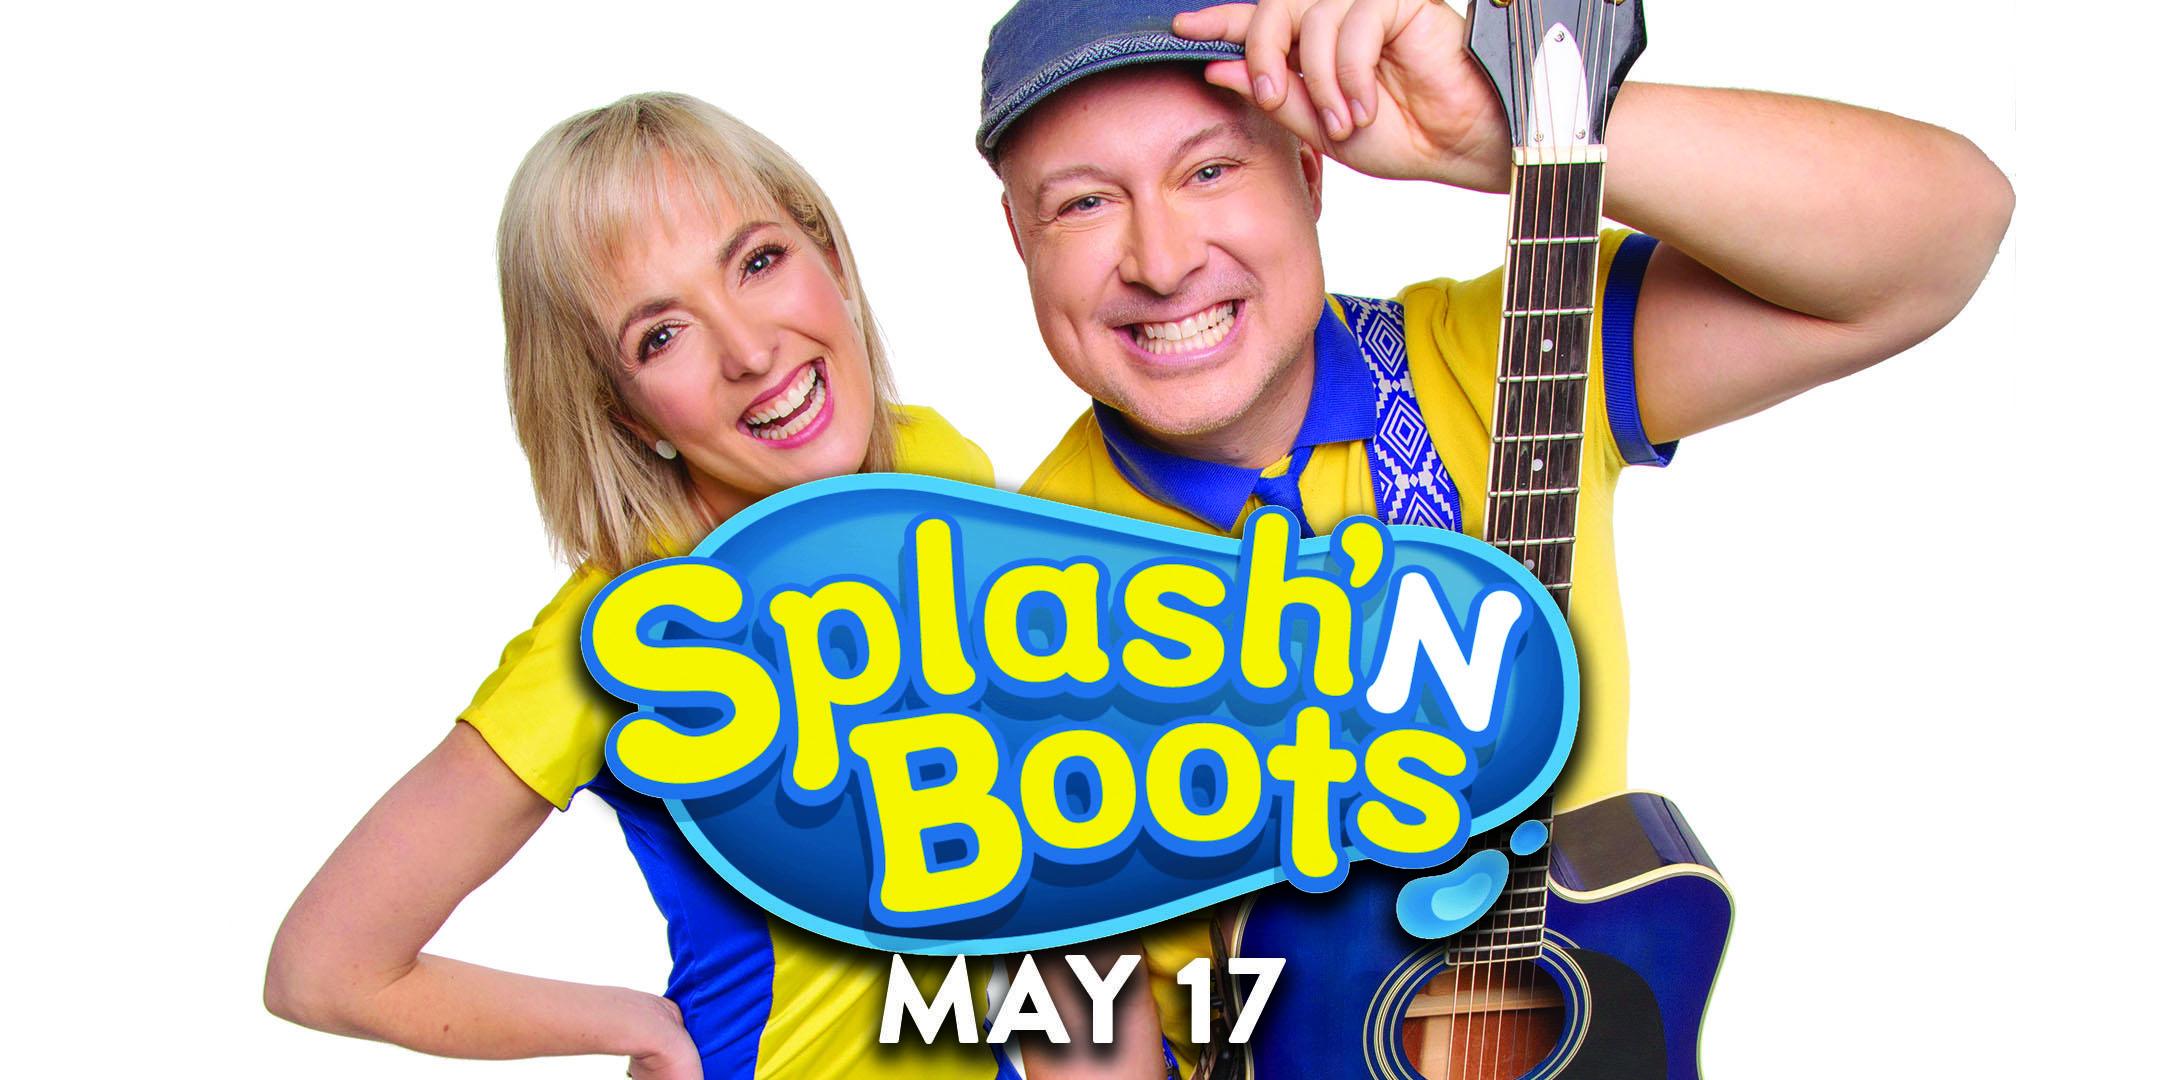 Splash N' Boots Kids Concert!